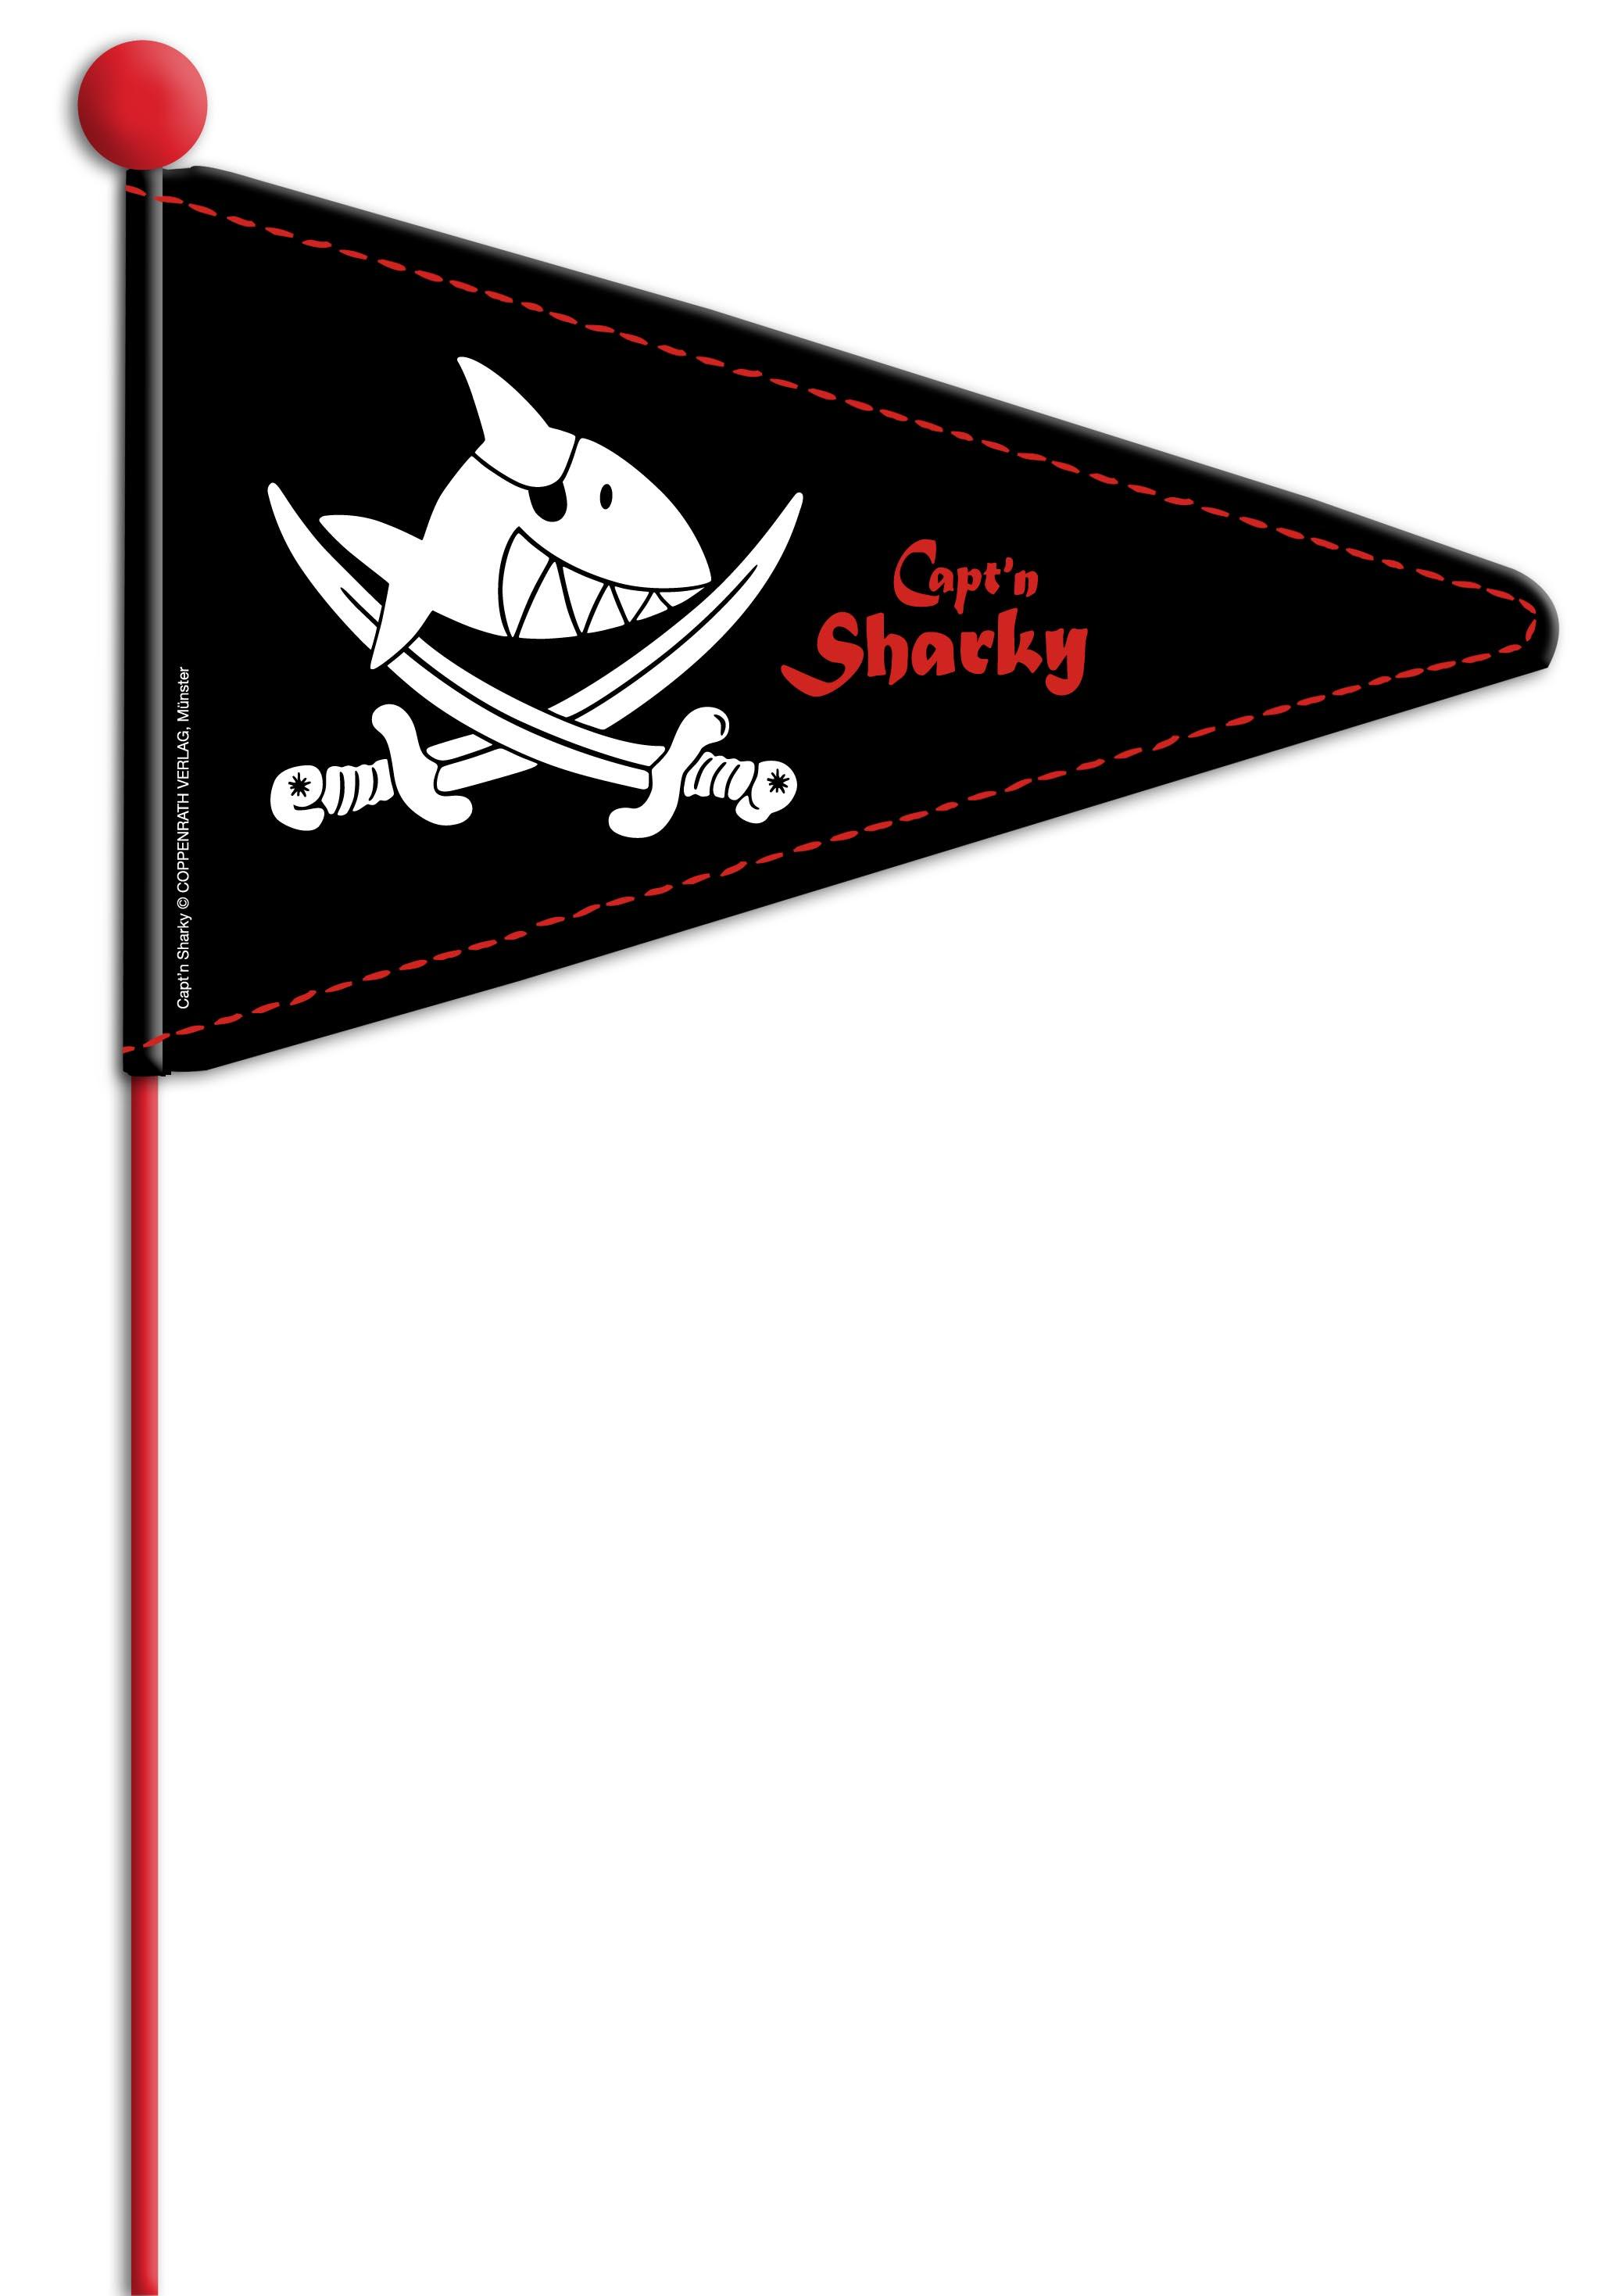 Sicherheitswimpel (teilbar) Capt'n Sharky (Marke Bike Fashion)